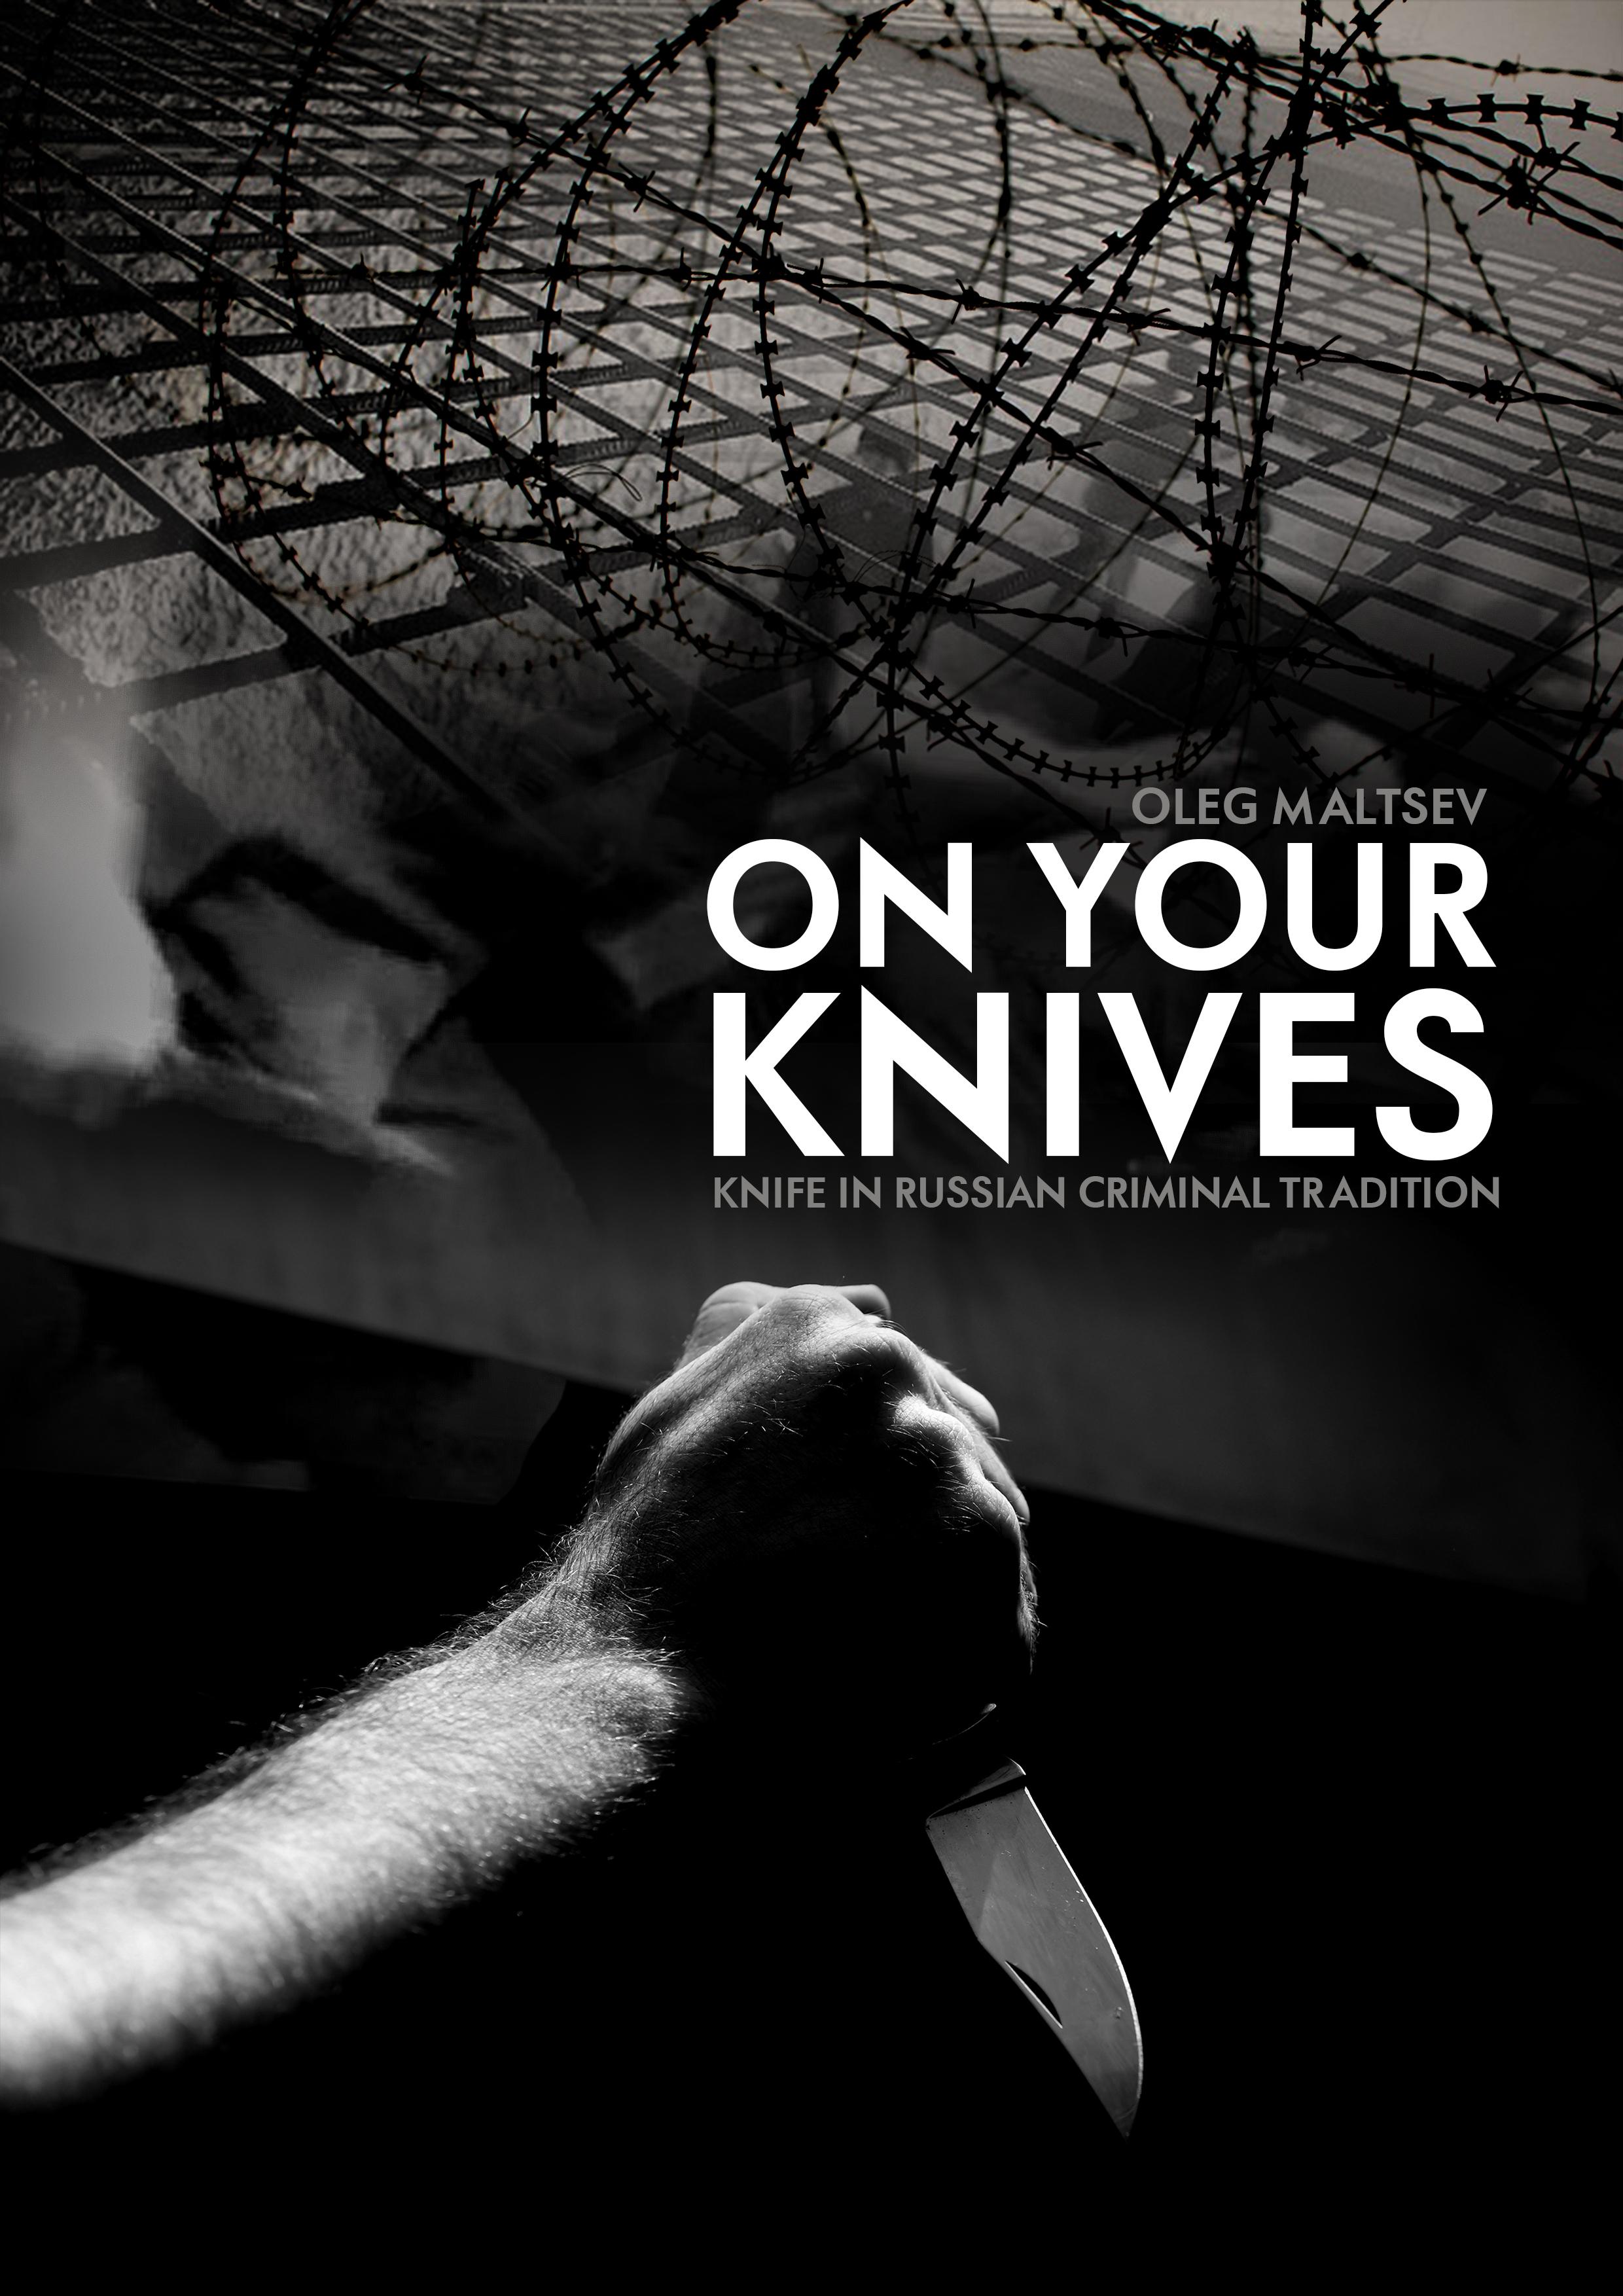 On your knives. Oleg Maltsev